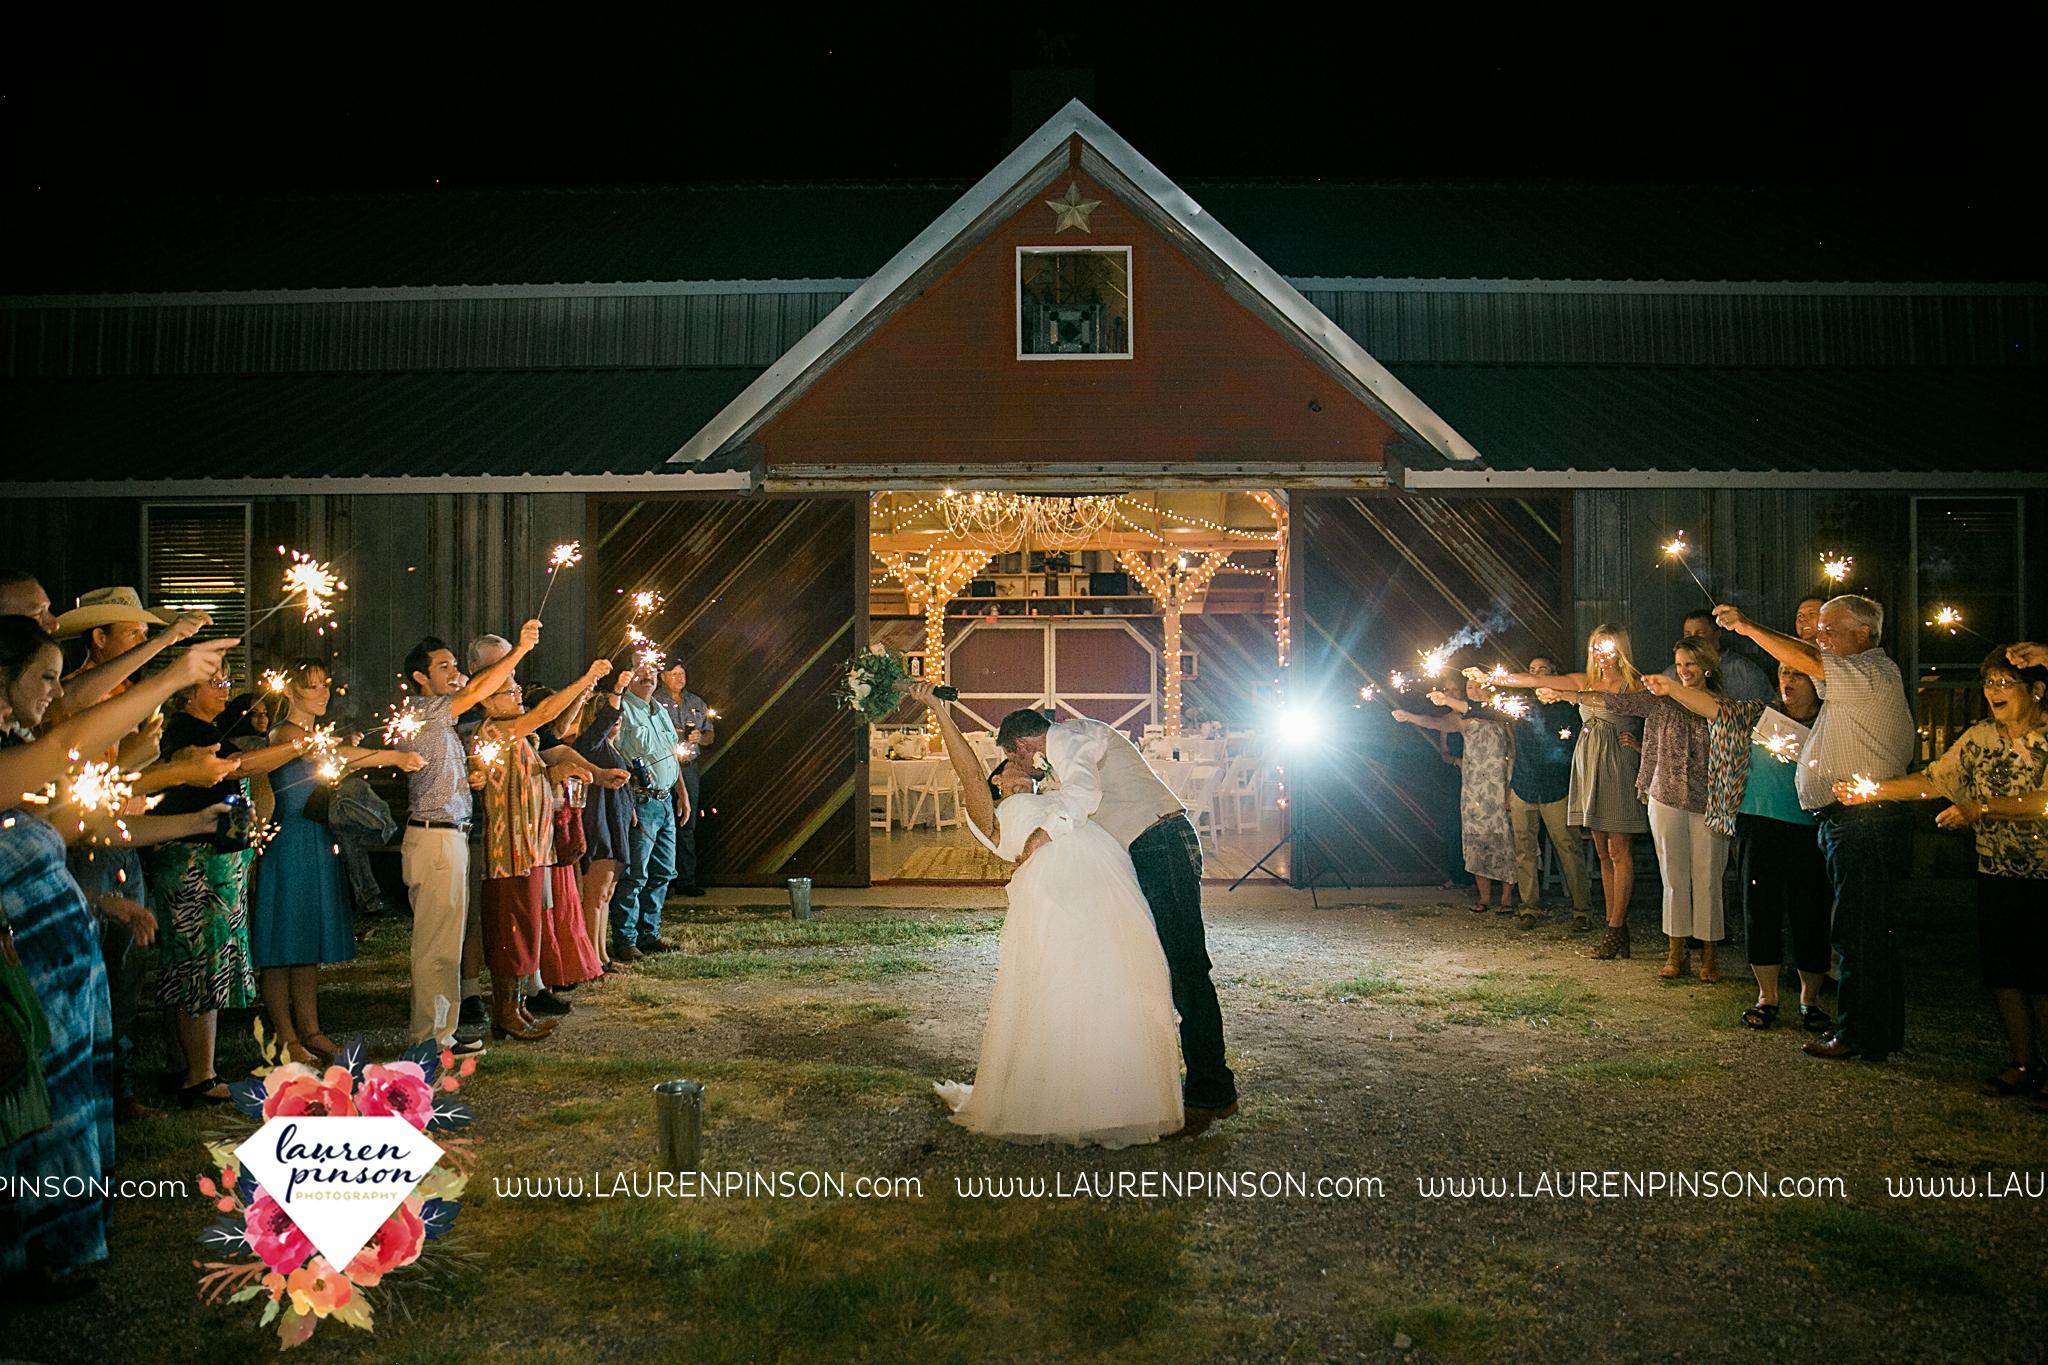 jones-barn-willow-creek-ranch-wedding-in-cleburne-texas-fort-worth-dfw-wichita-falls-wedding-photography_3269.jpg